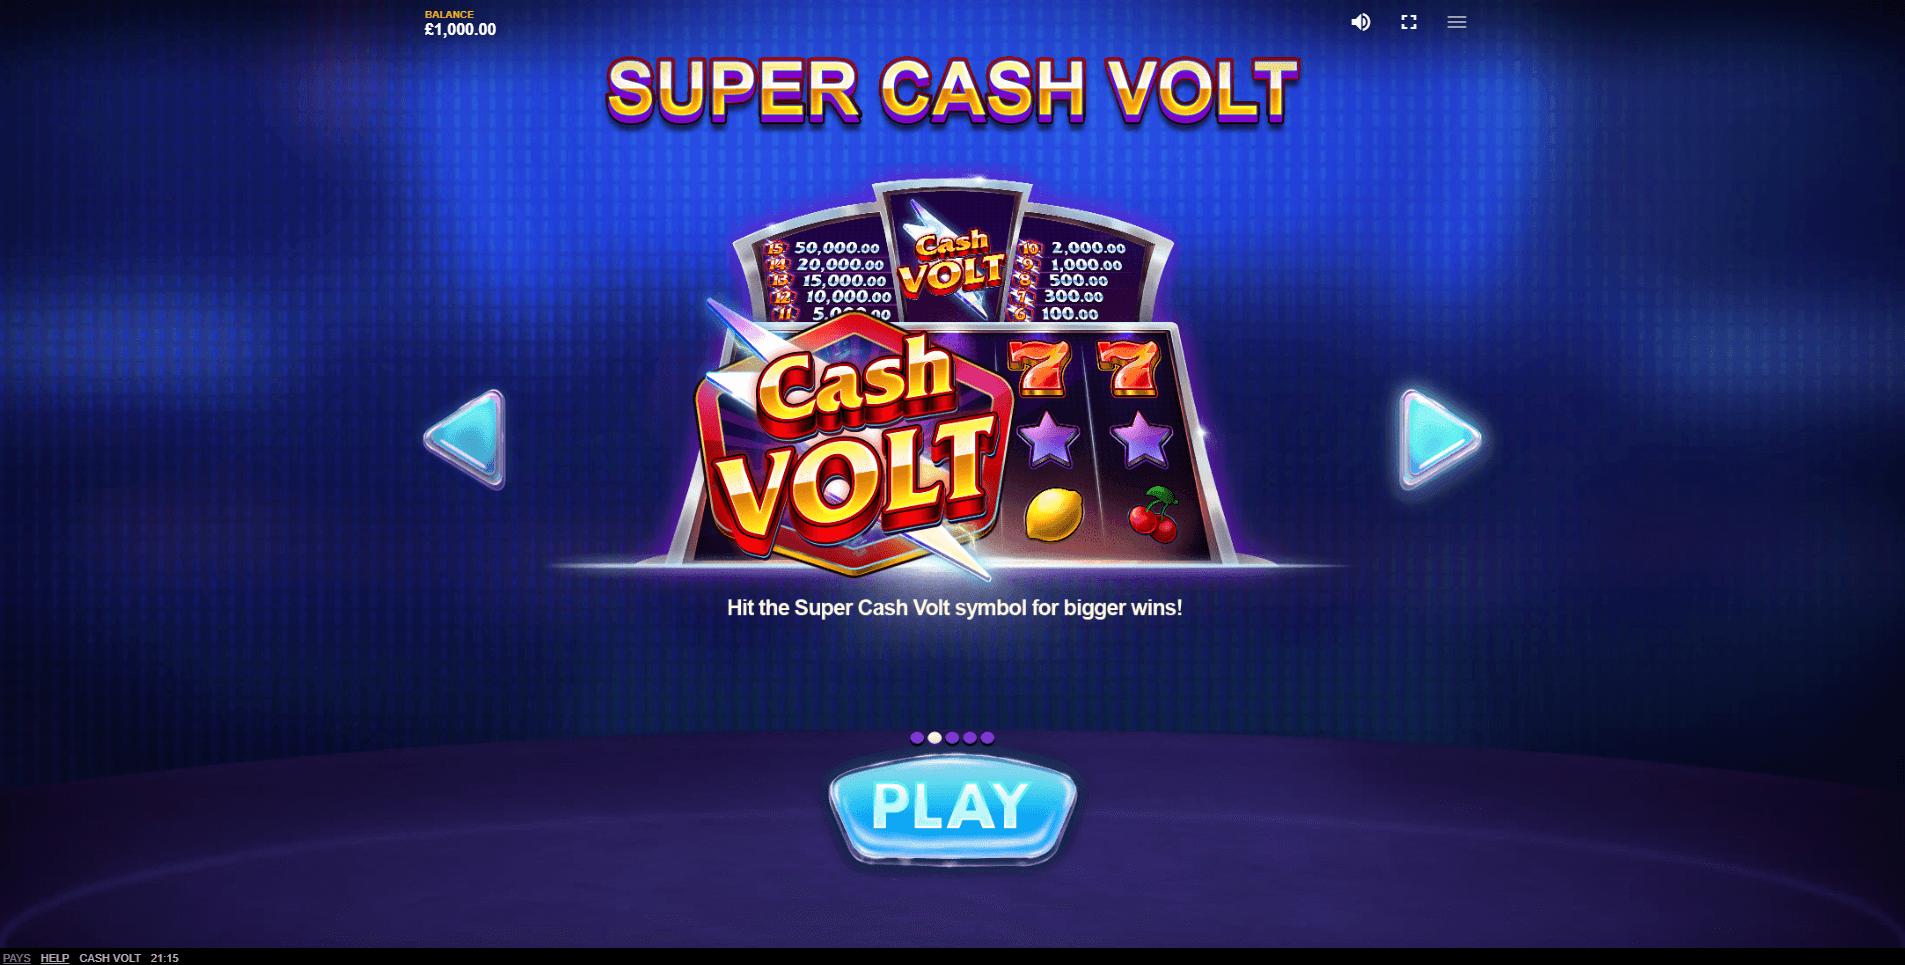 Cash Volt Slot Machine